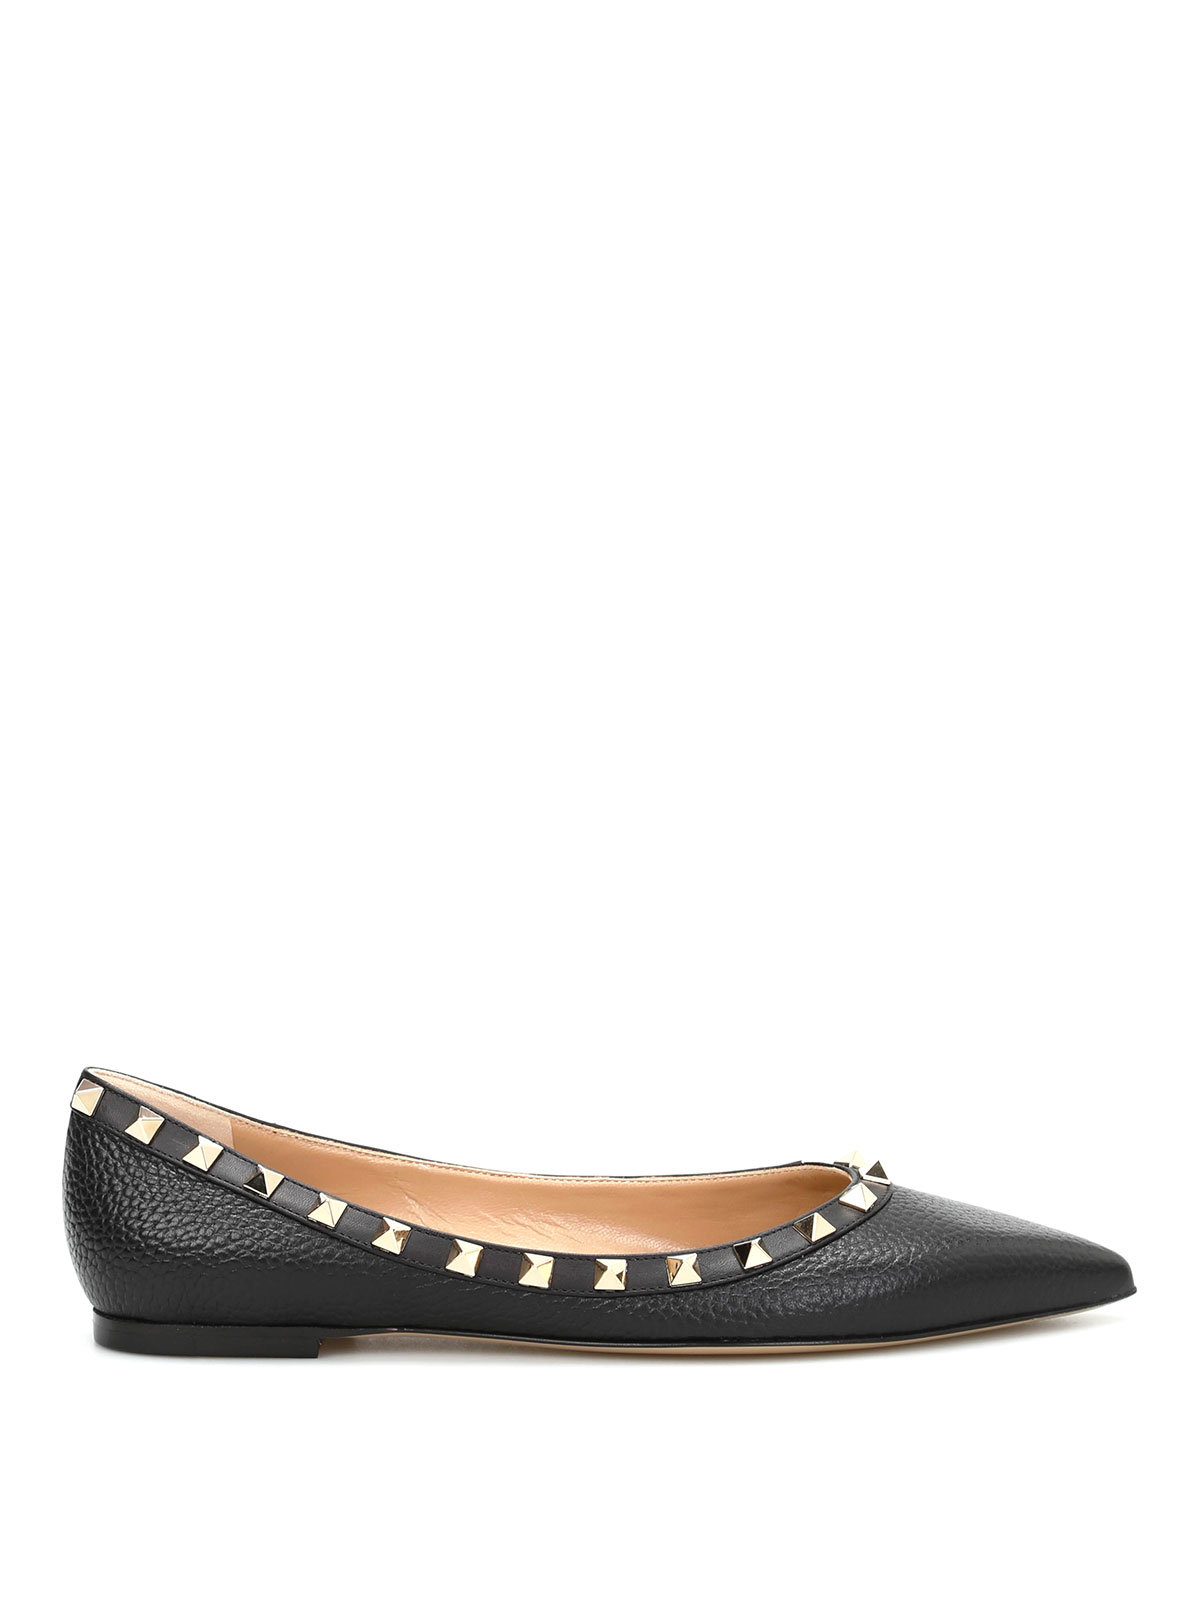 8fa45dc128ff Valentino Garavani - Studded trims leather pointy flats - flat shoes ...